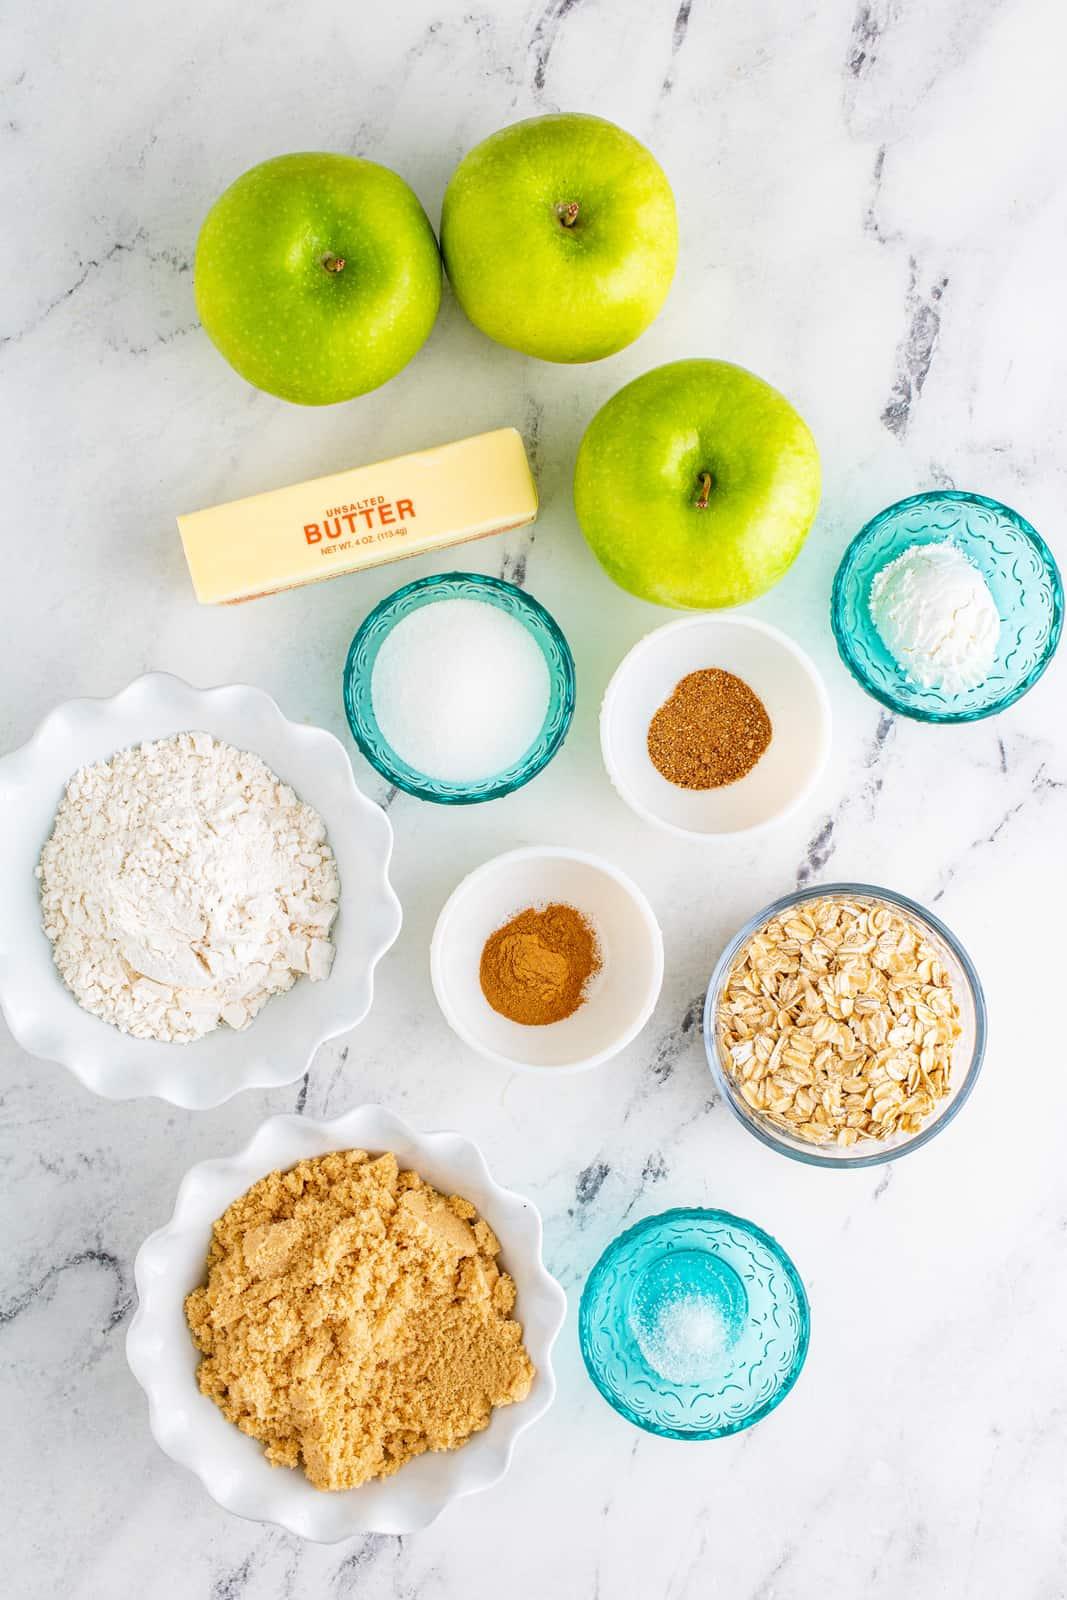 Ingredients needed to make Easy Apple Crisp.